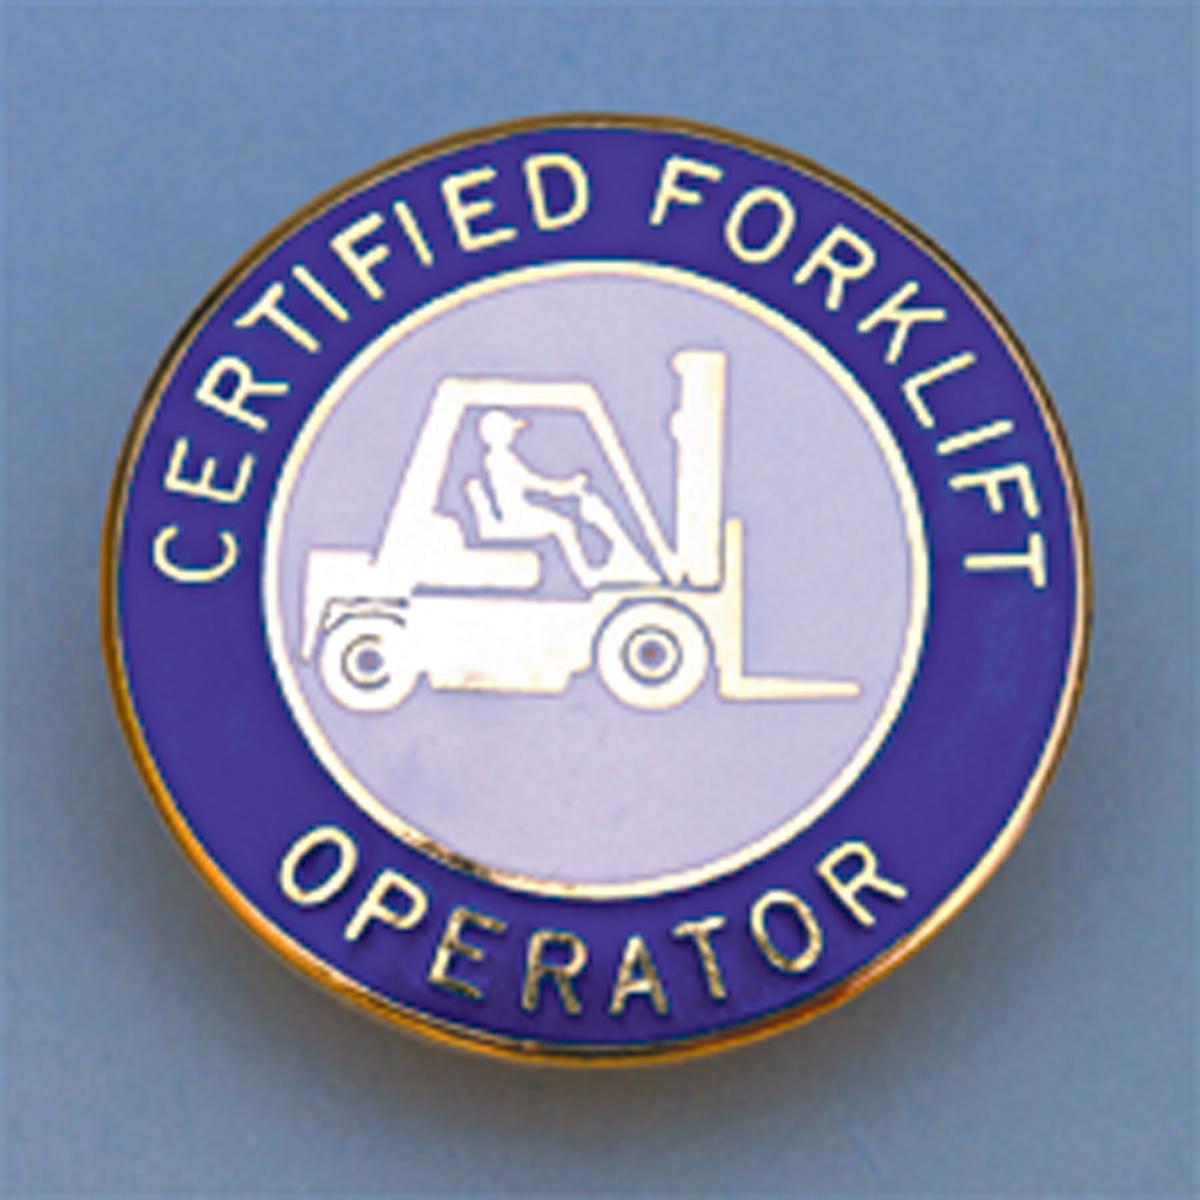 CERTIFIED FORKLIFT OPERATOR